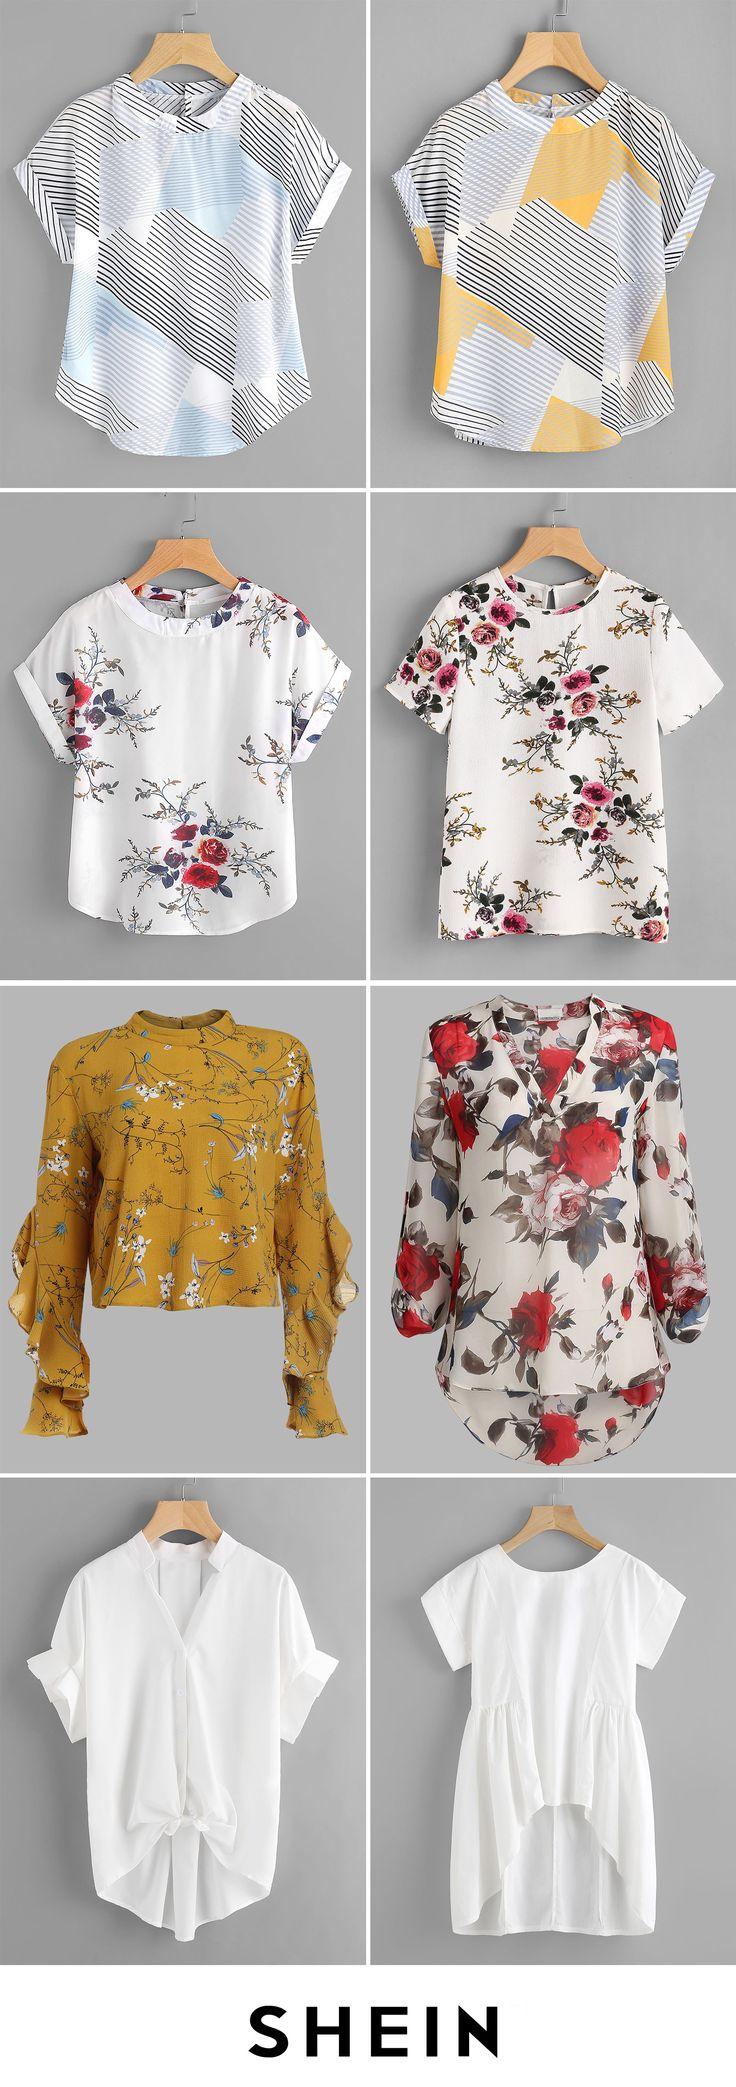 Cheap & chic blouses